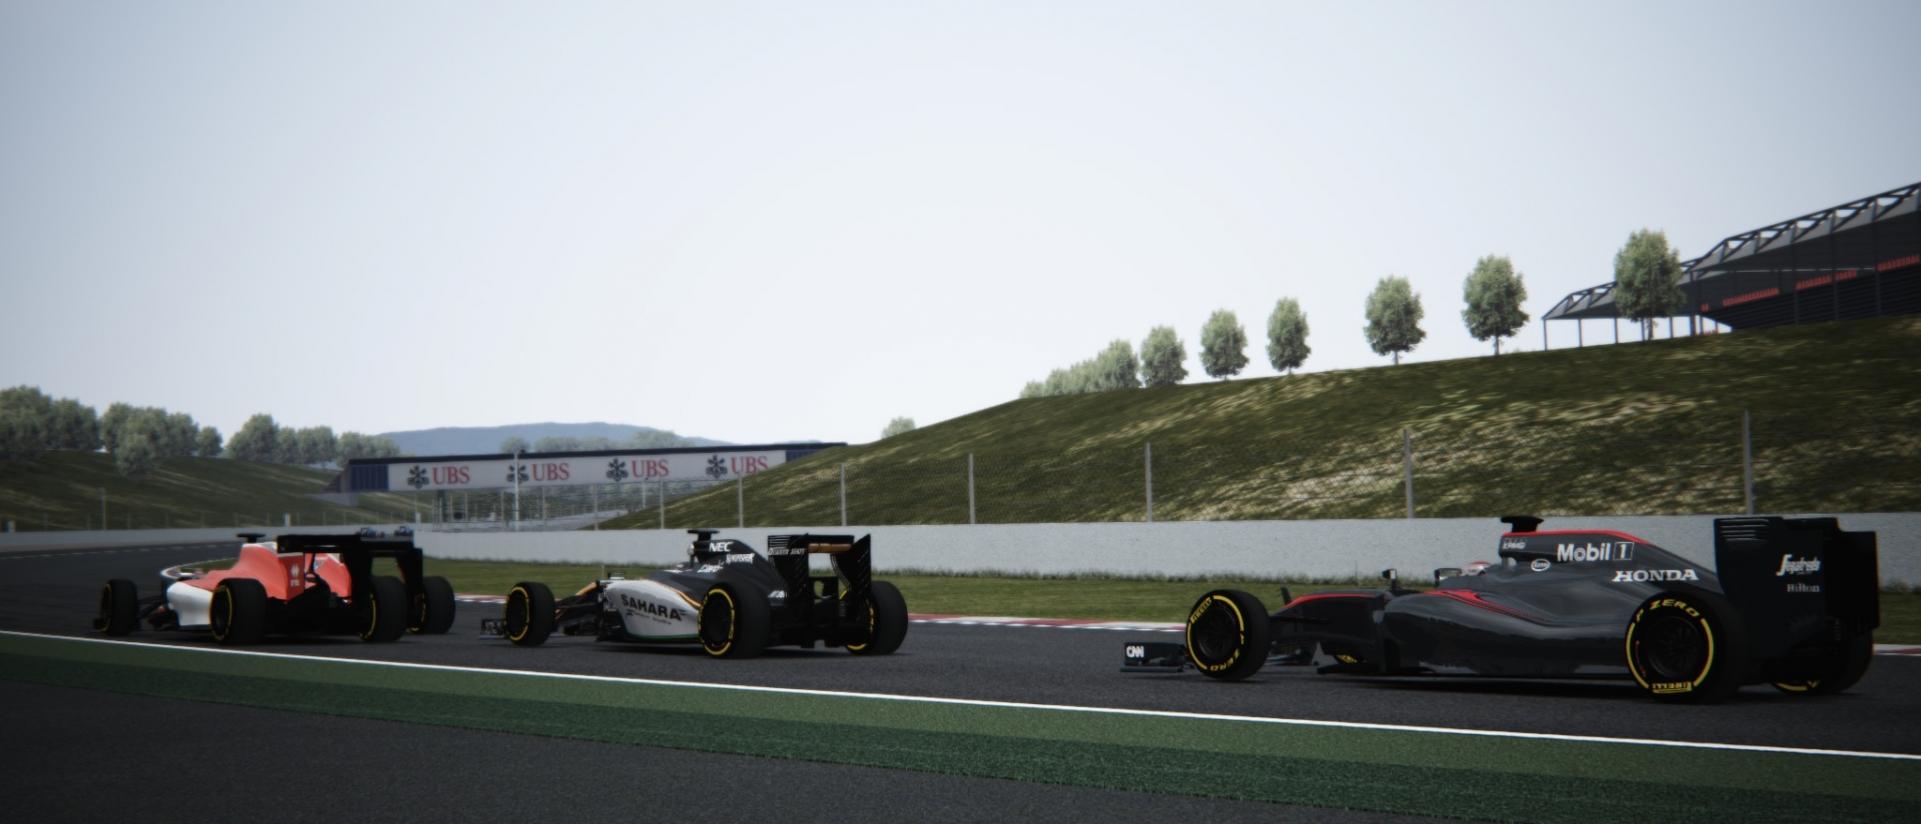 Assetto Corsa - ACFL F1 2015 Catalunya 08